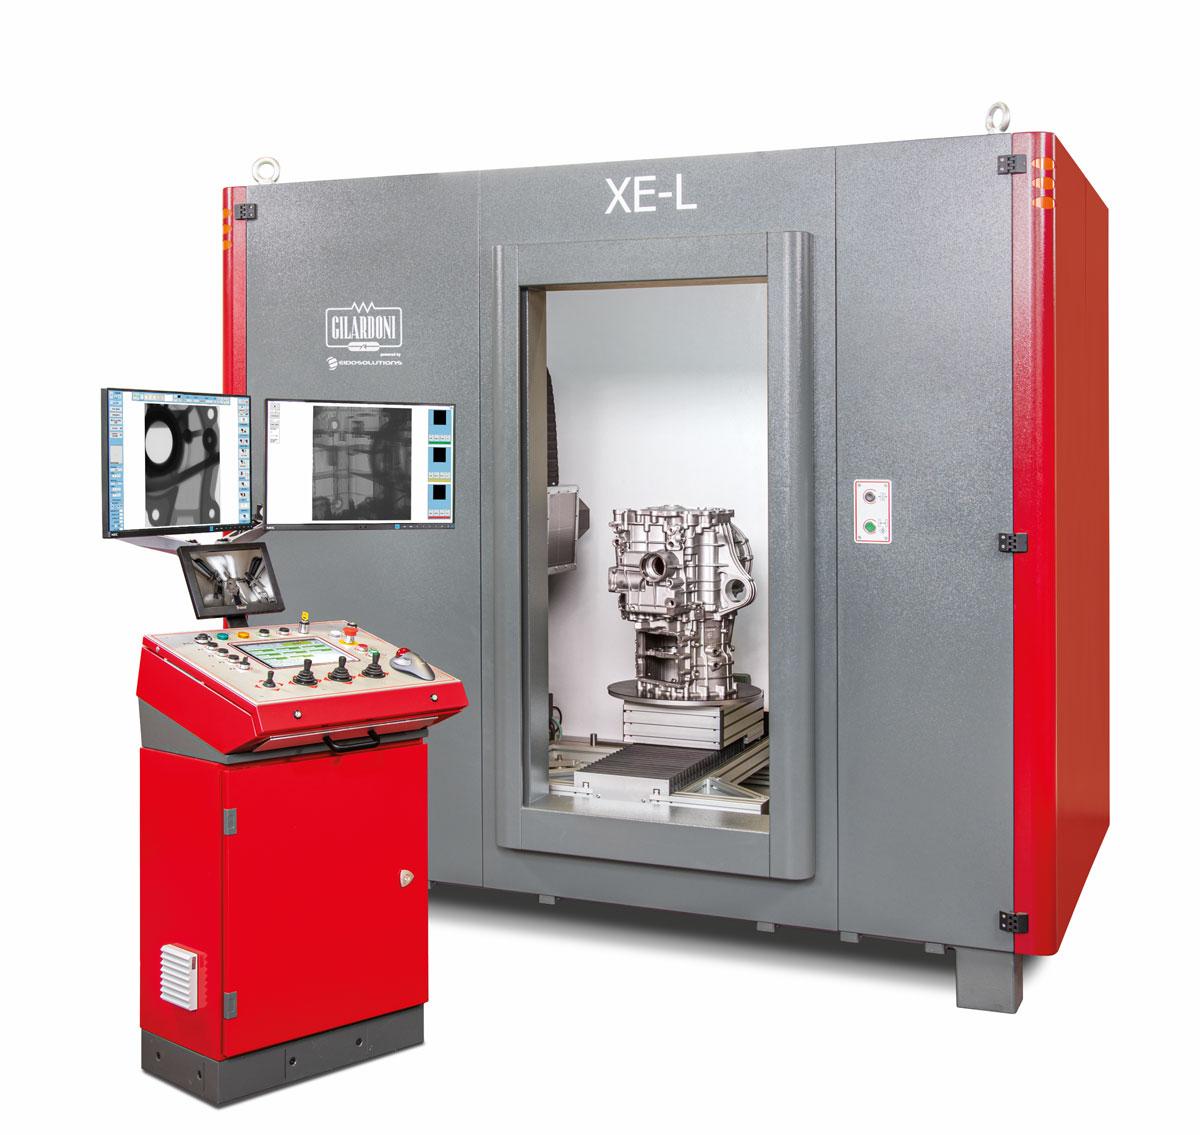 cabina XE-L partenership gilardoni LynX Inspection